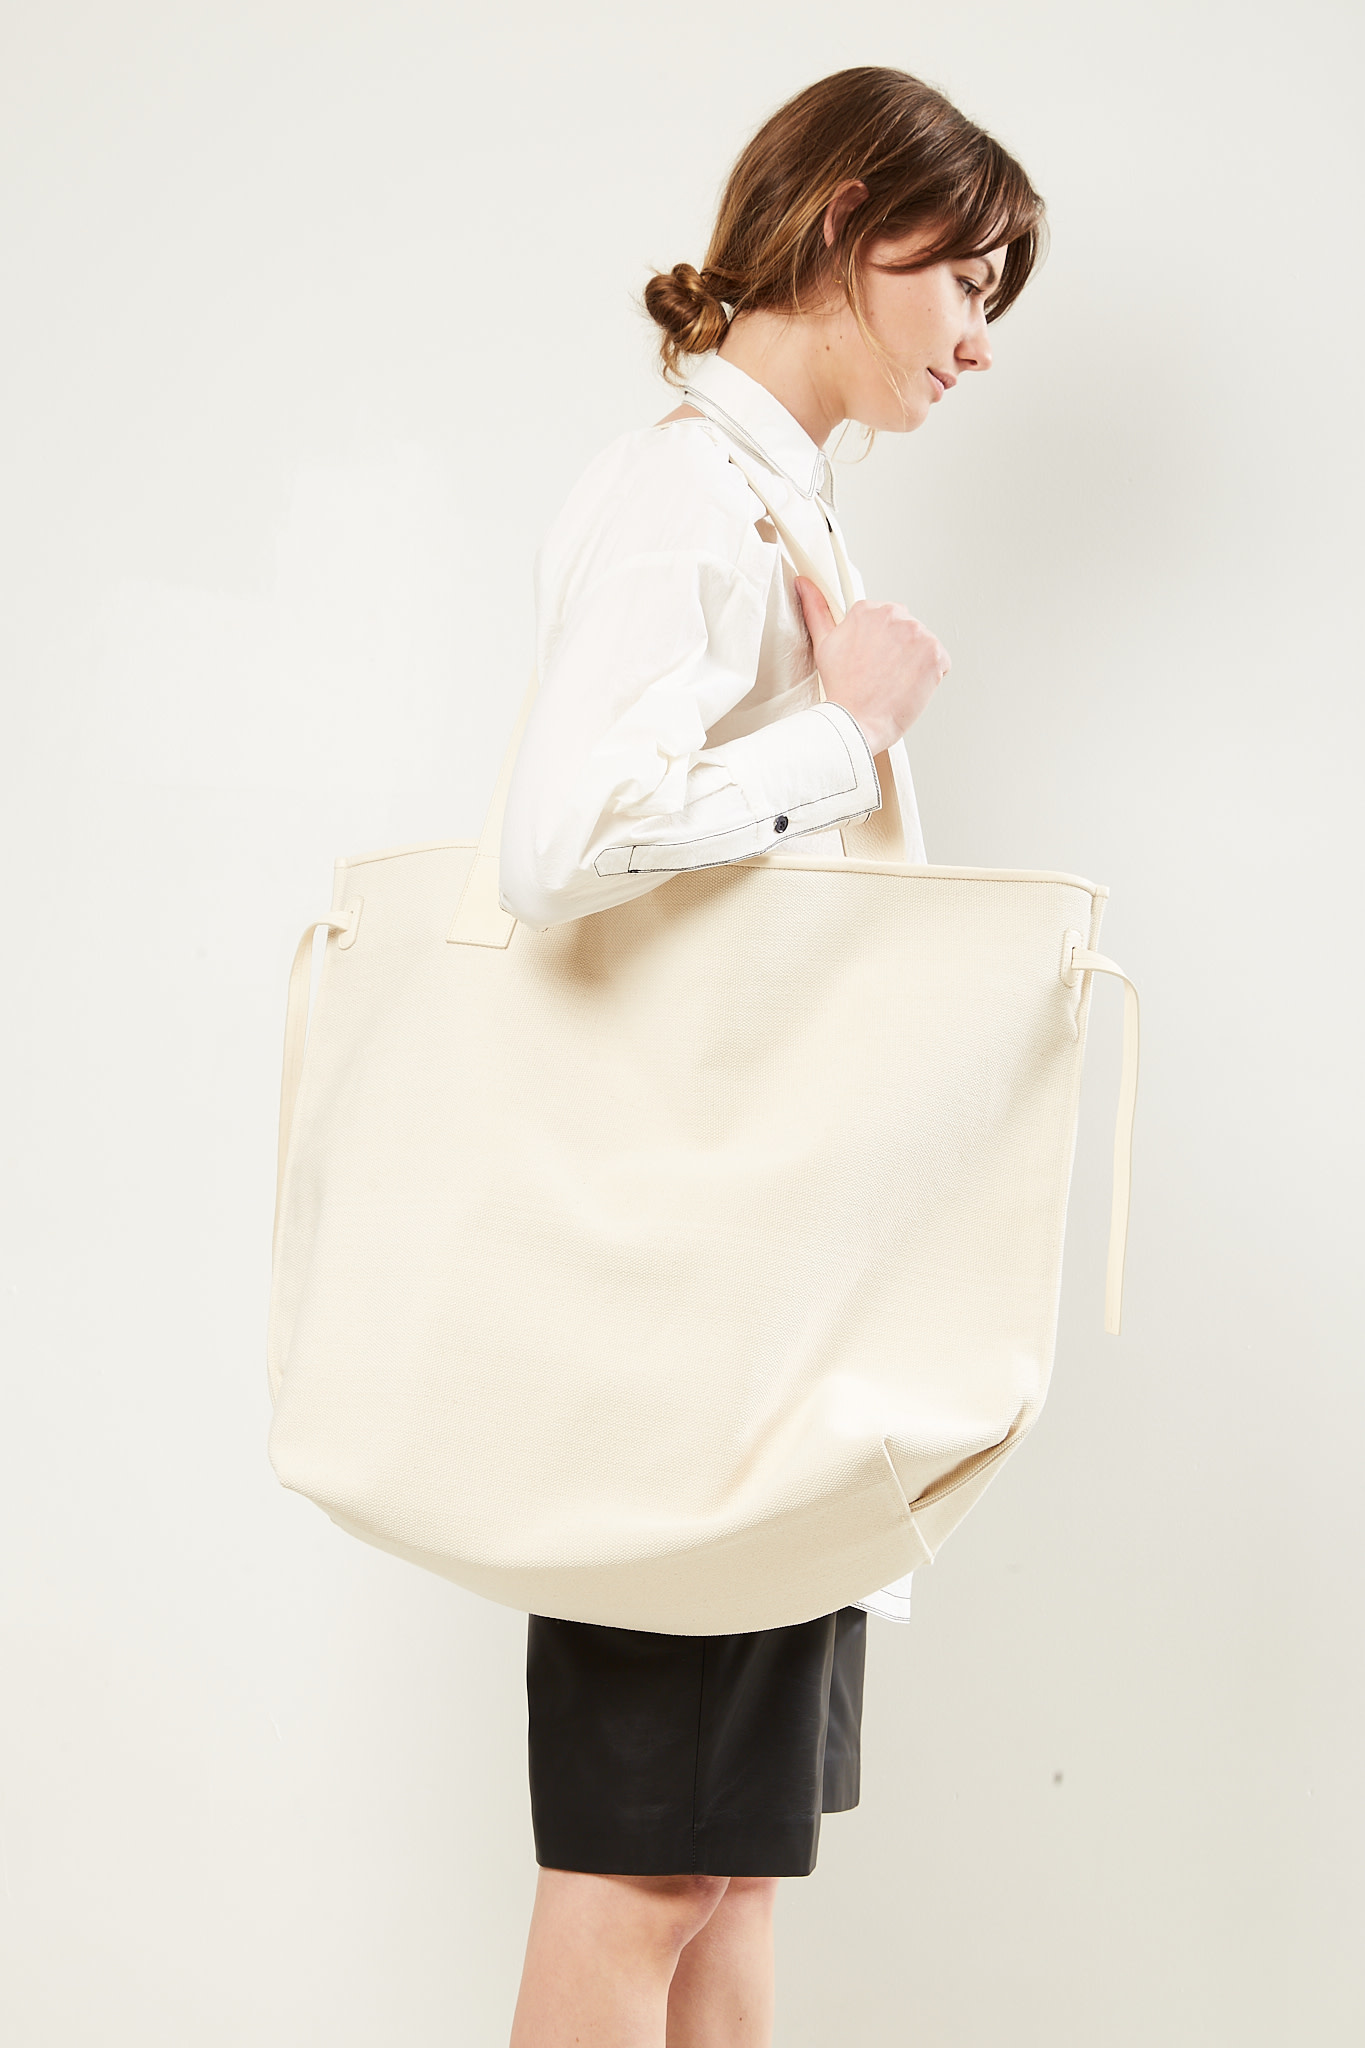 Aeron - Philippine bag